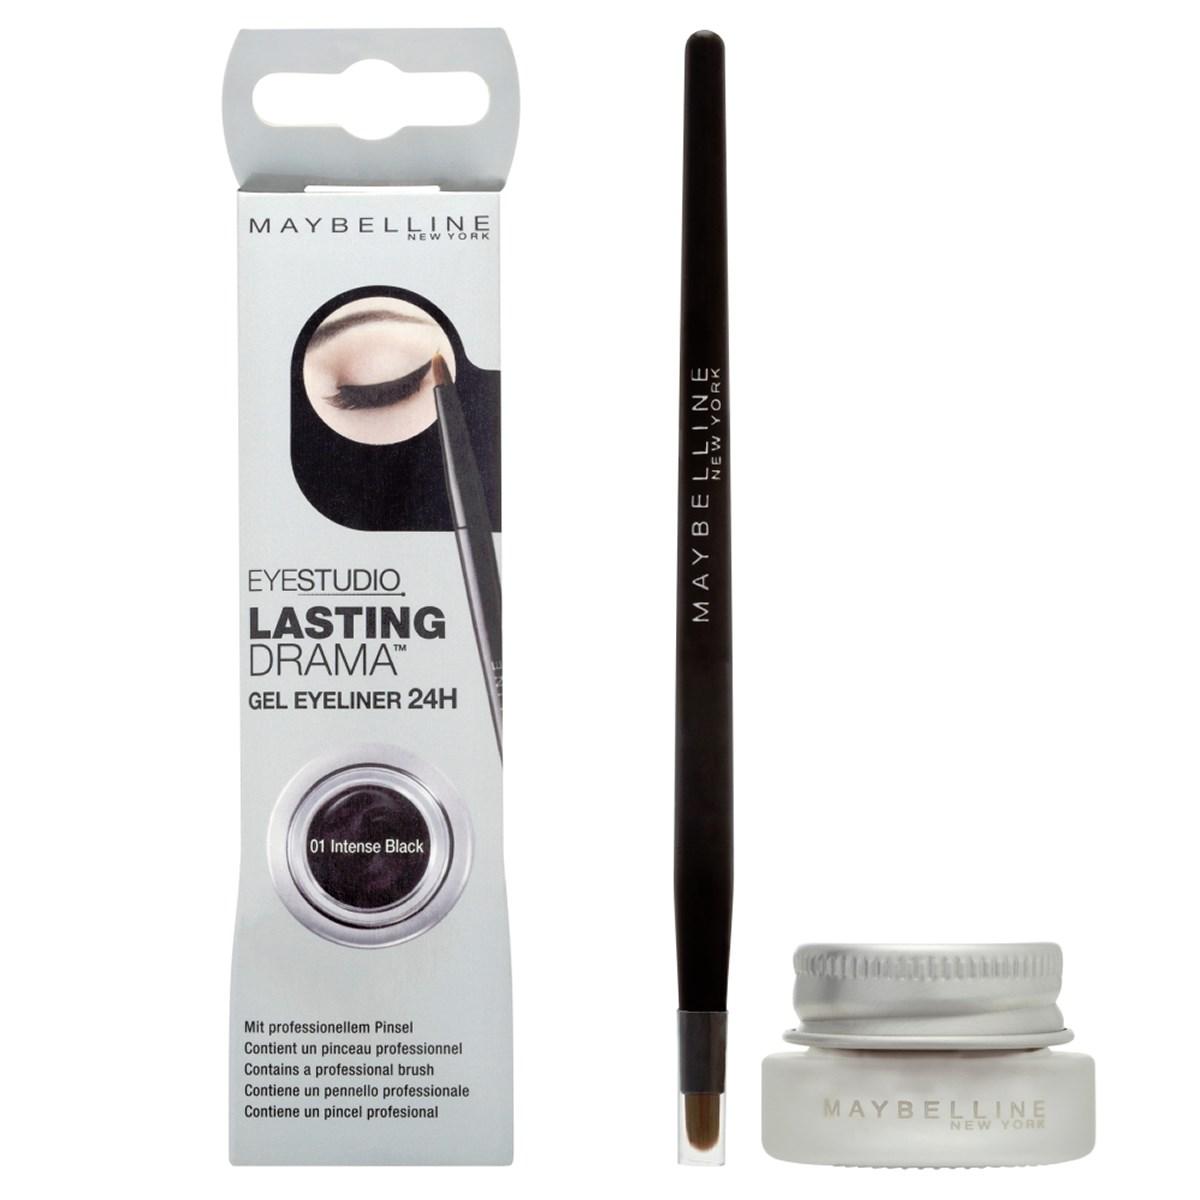 Maybelline Eye Studio Lasting Drama Gel Eyeliner 24H